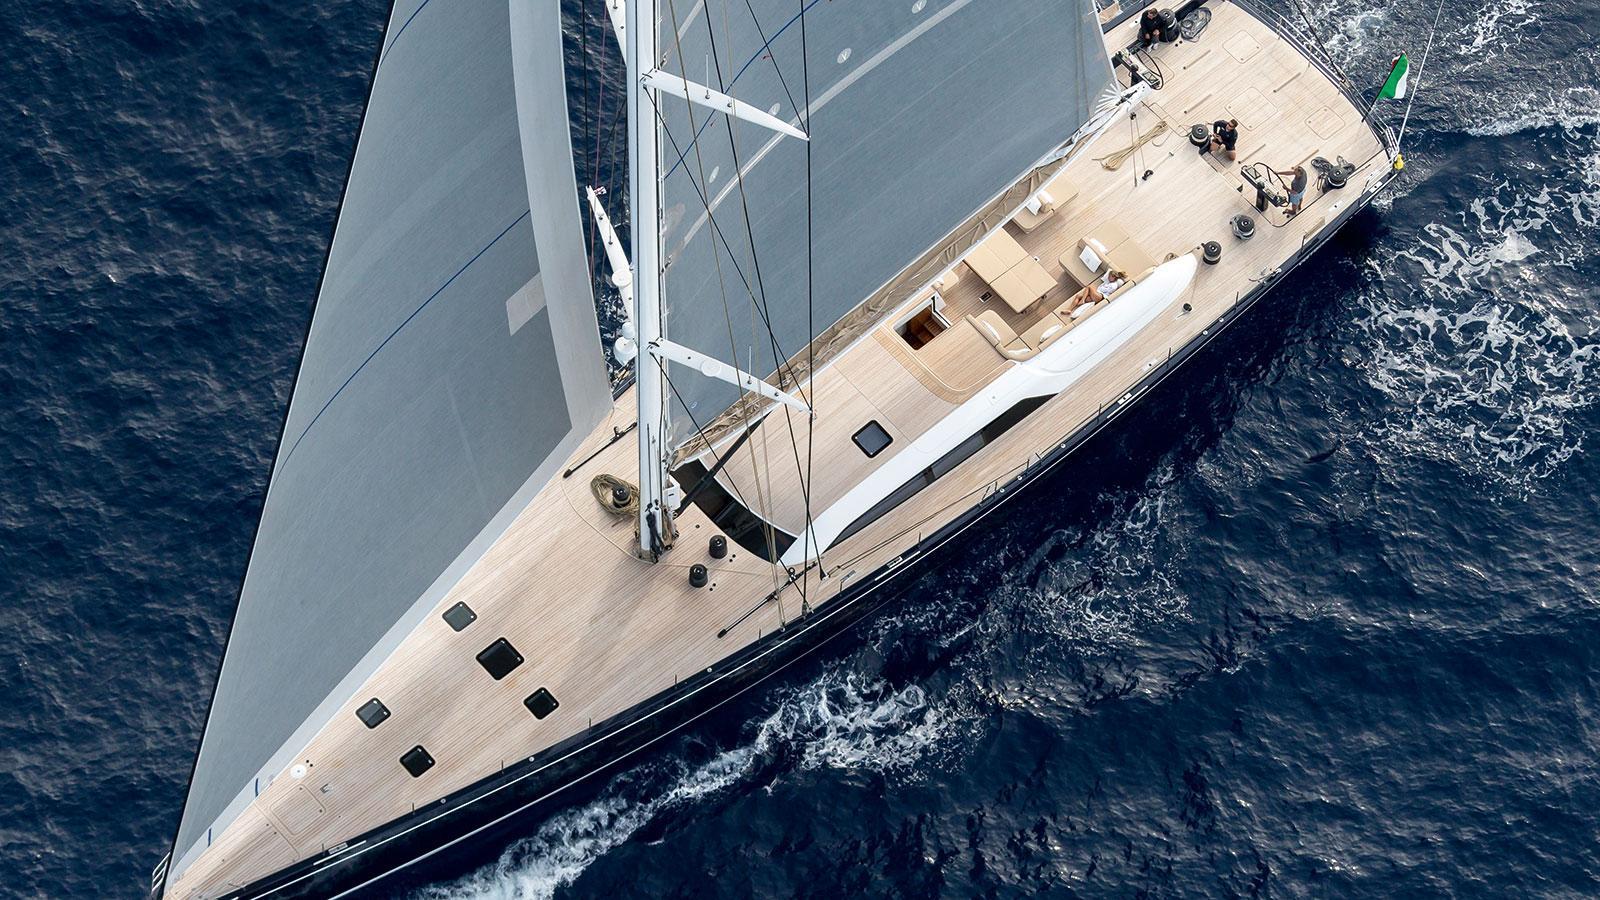 solleone-motor-yacht-nautors-swan-115-s-2015-35m-aerial